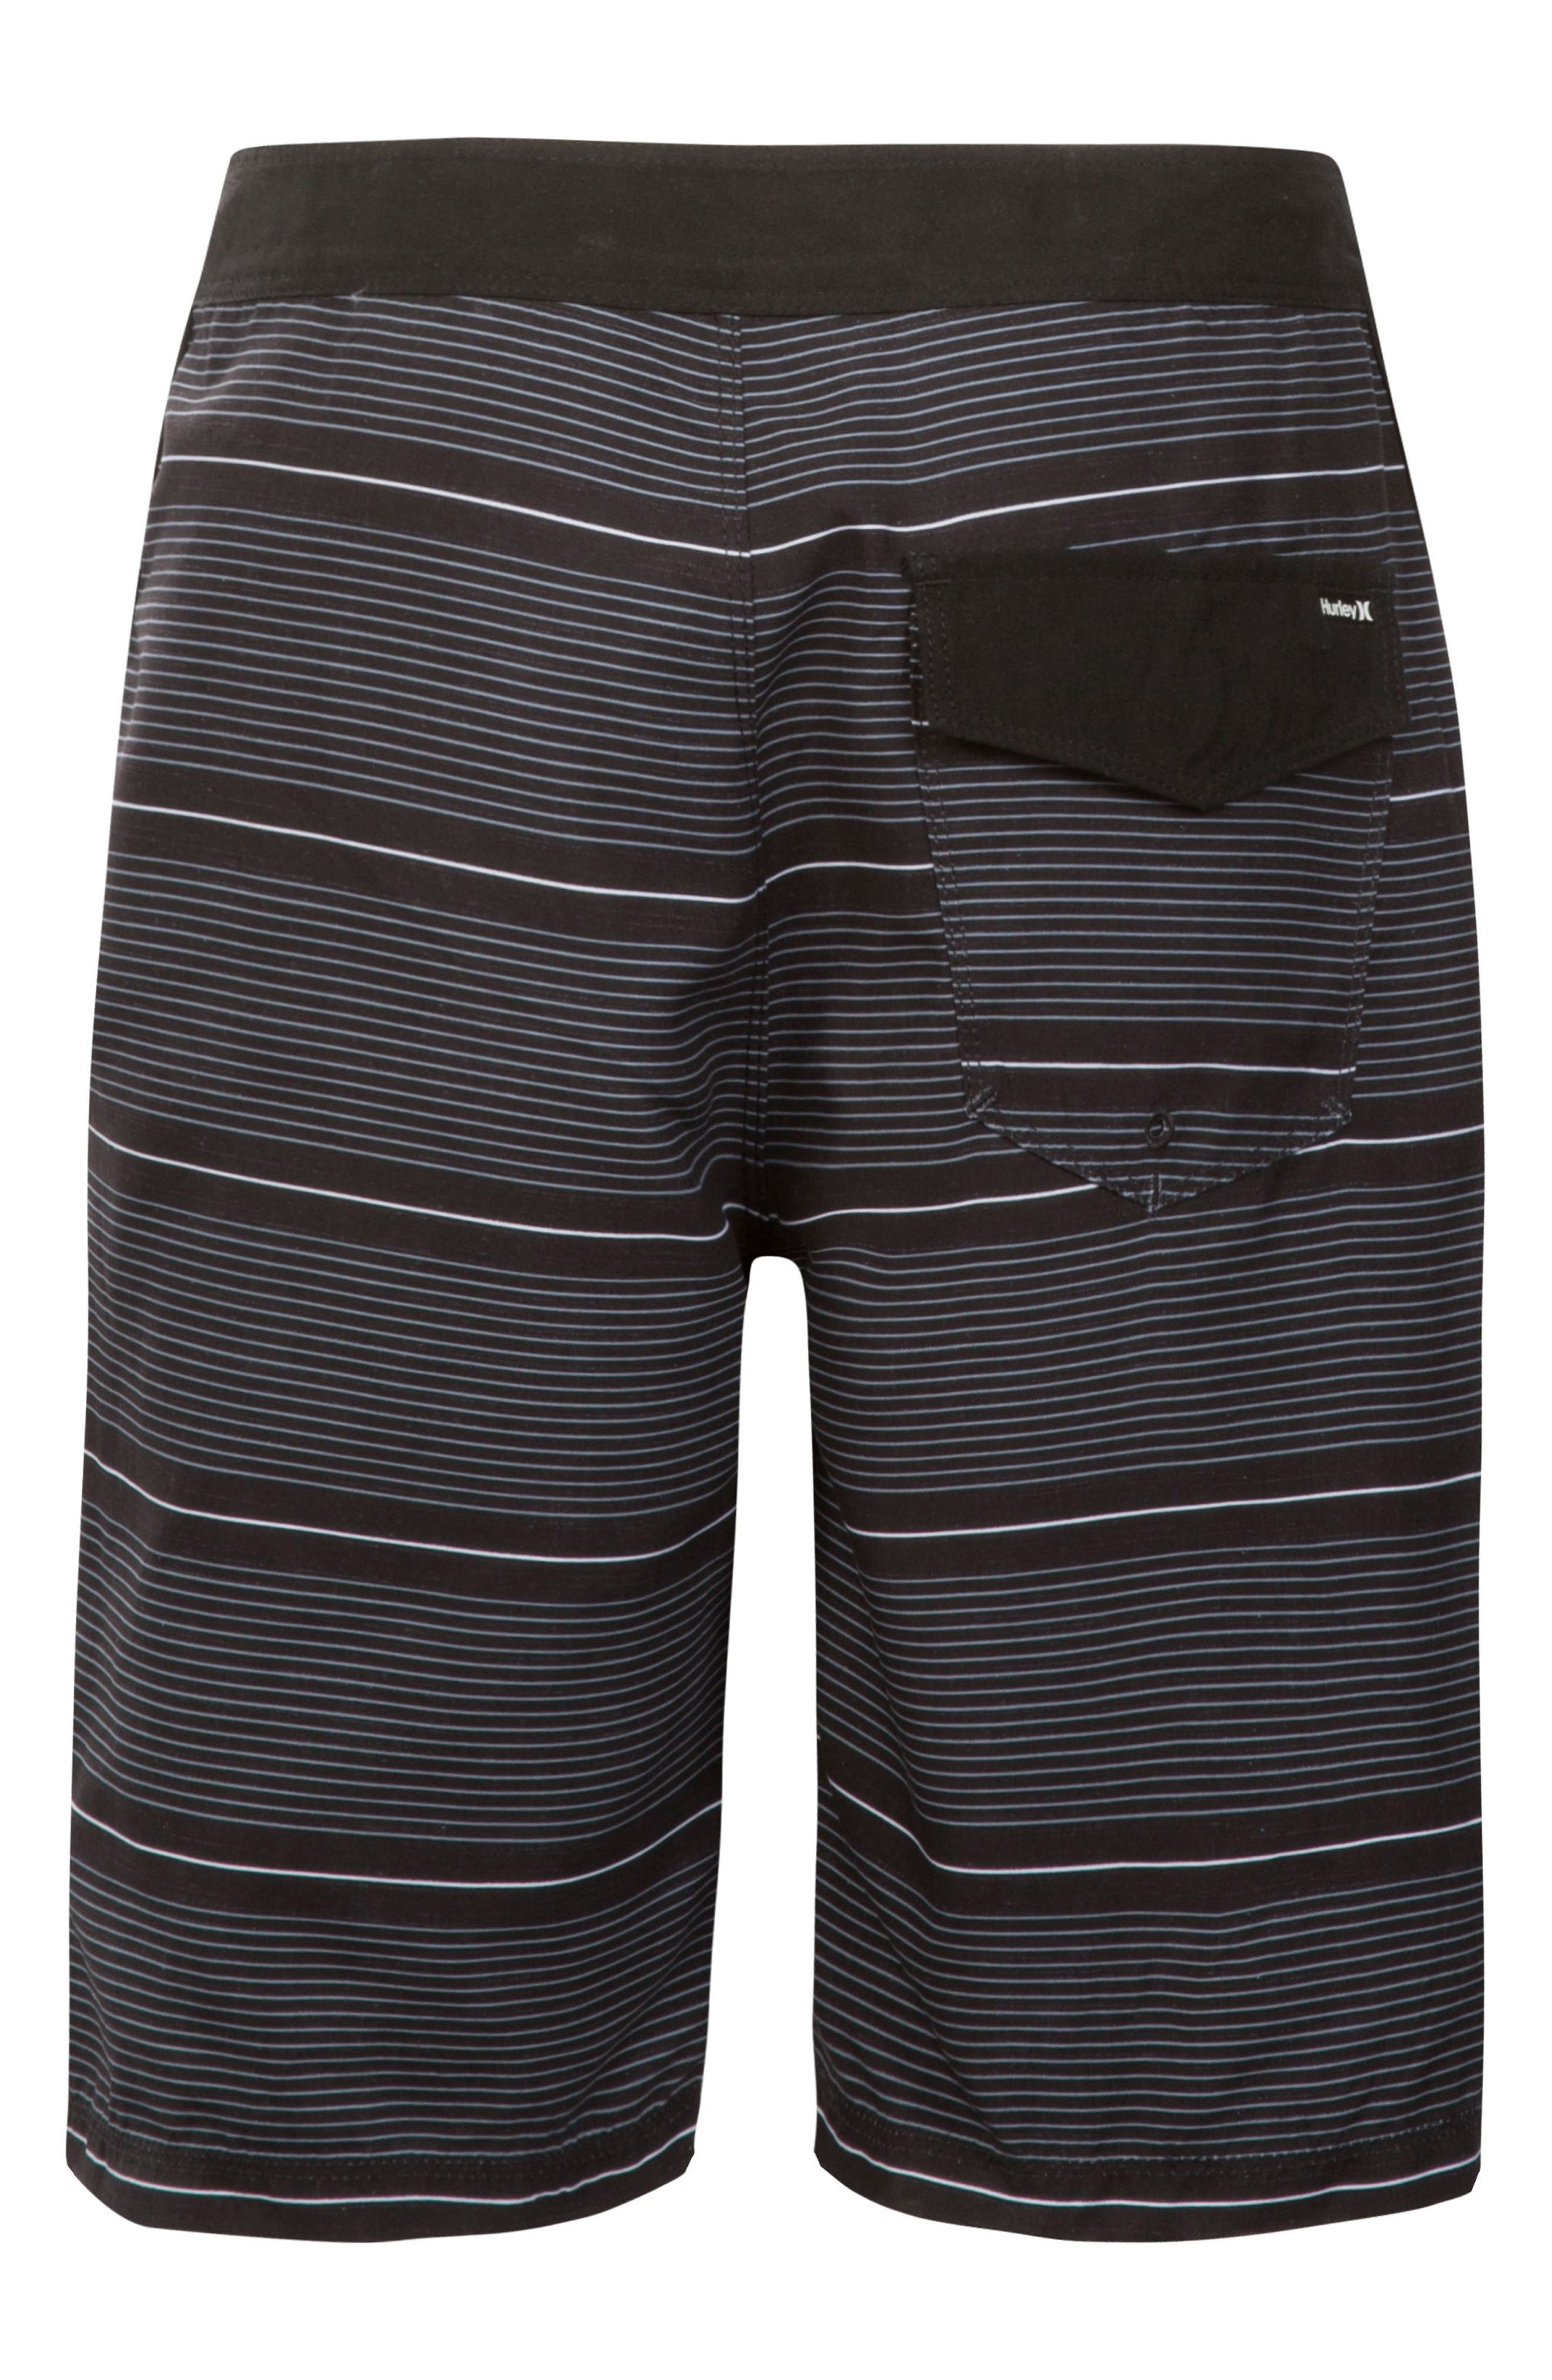 Shoreline Board Shorts,                             Alternate thumbnail 2, color,                             BLACK